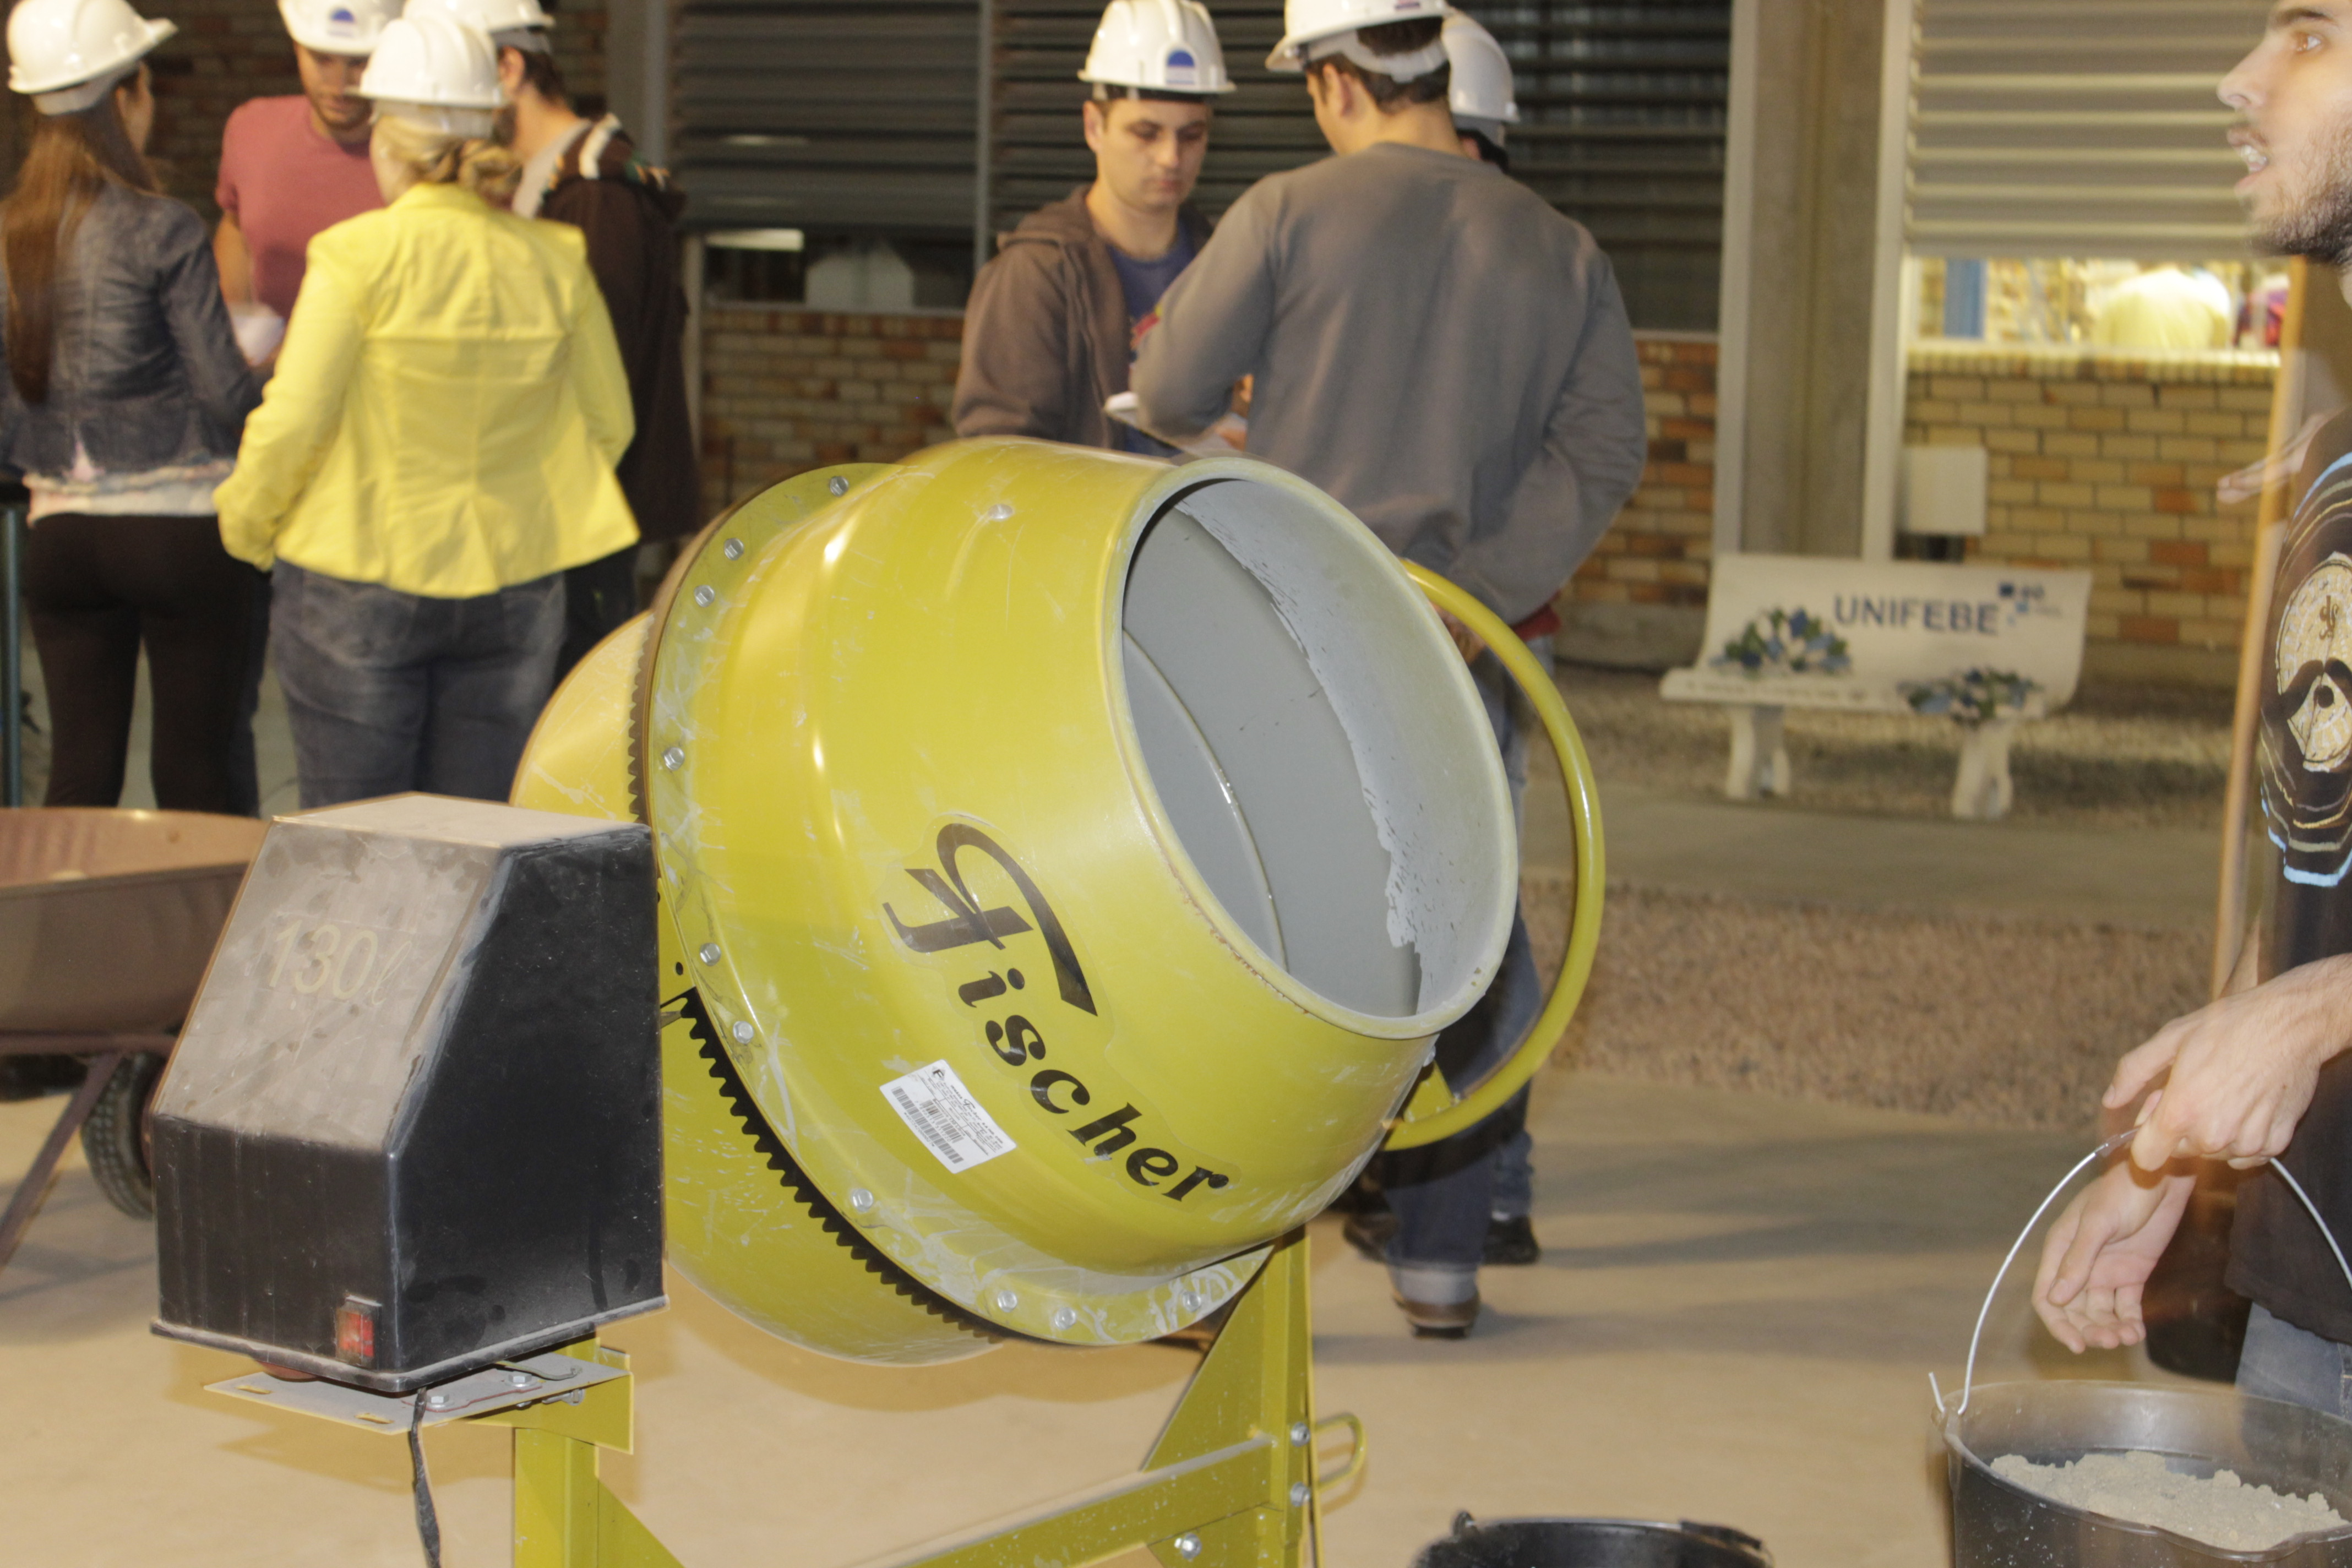 Turma de Engenharia Civil participa de desafio de concreto